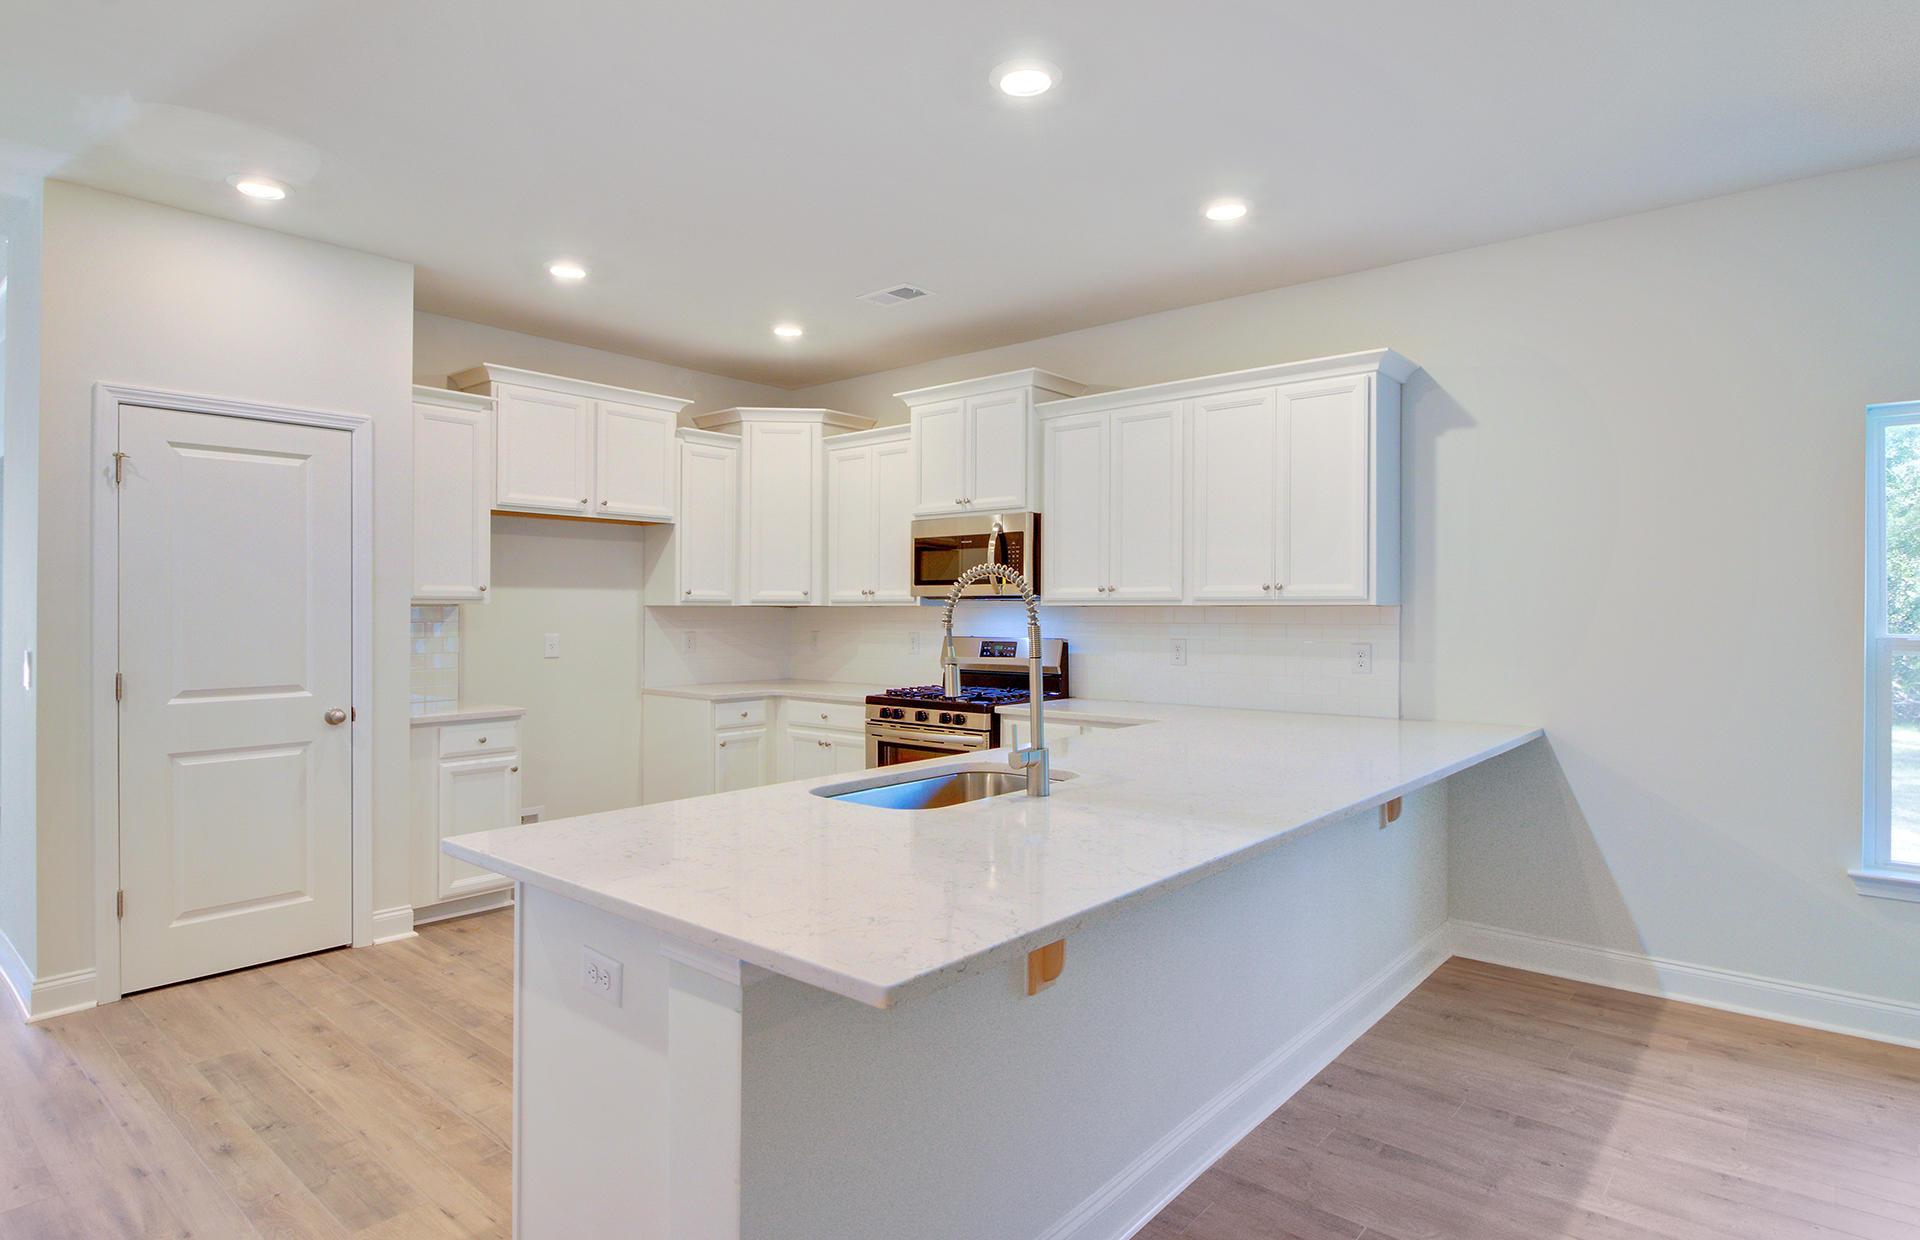 Park West Homes For Sale - 3030 Rice Field, Mount Pleasant, SC - 24